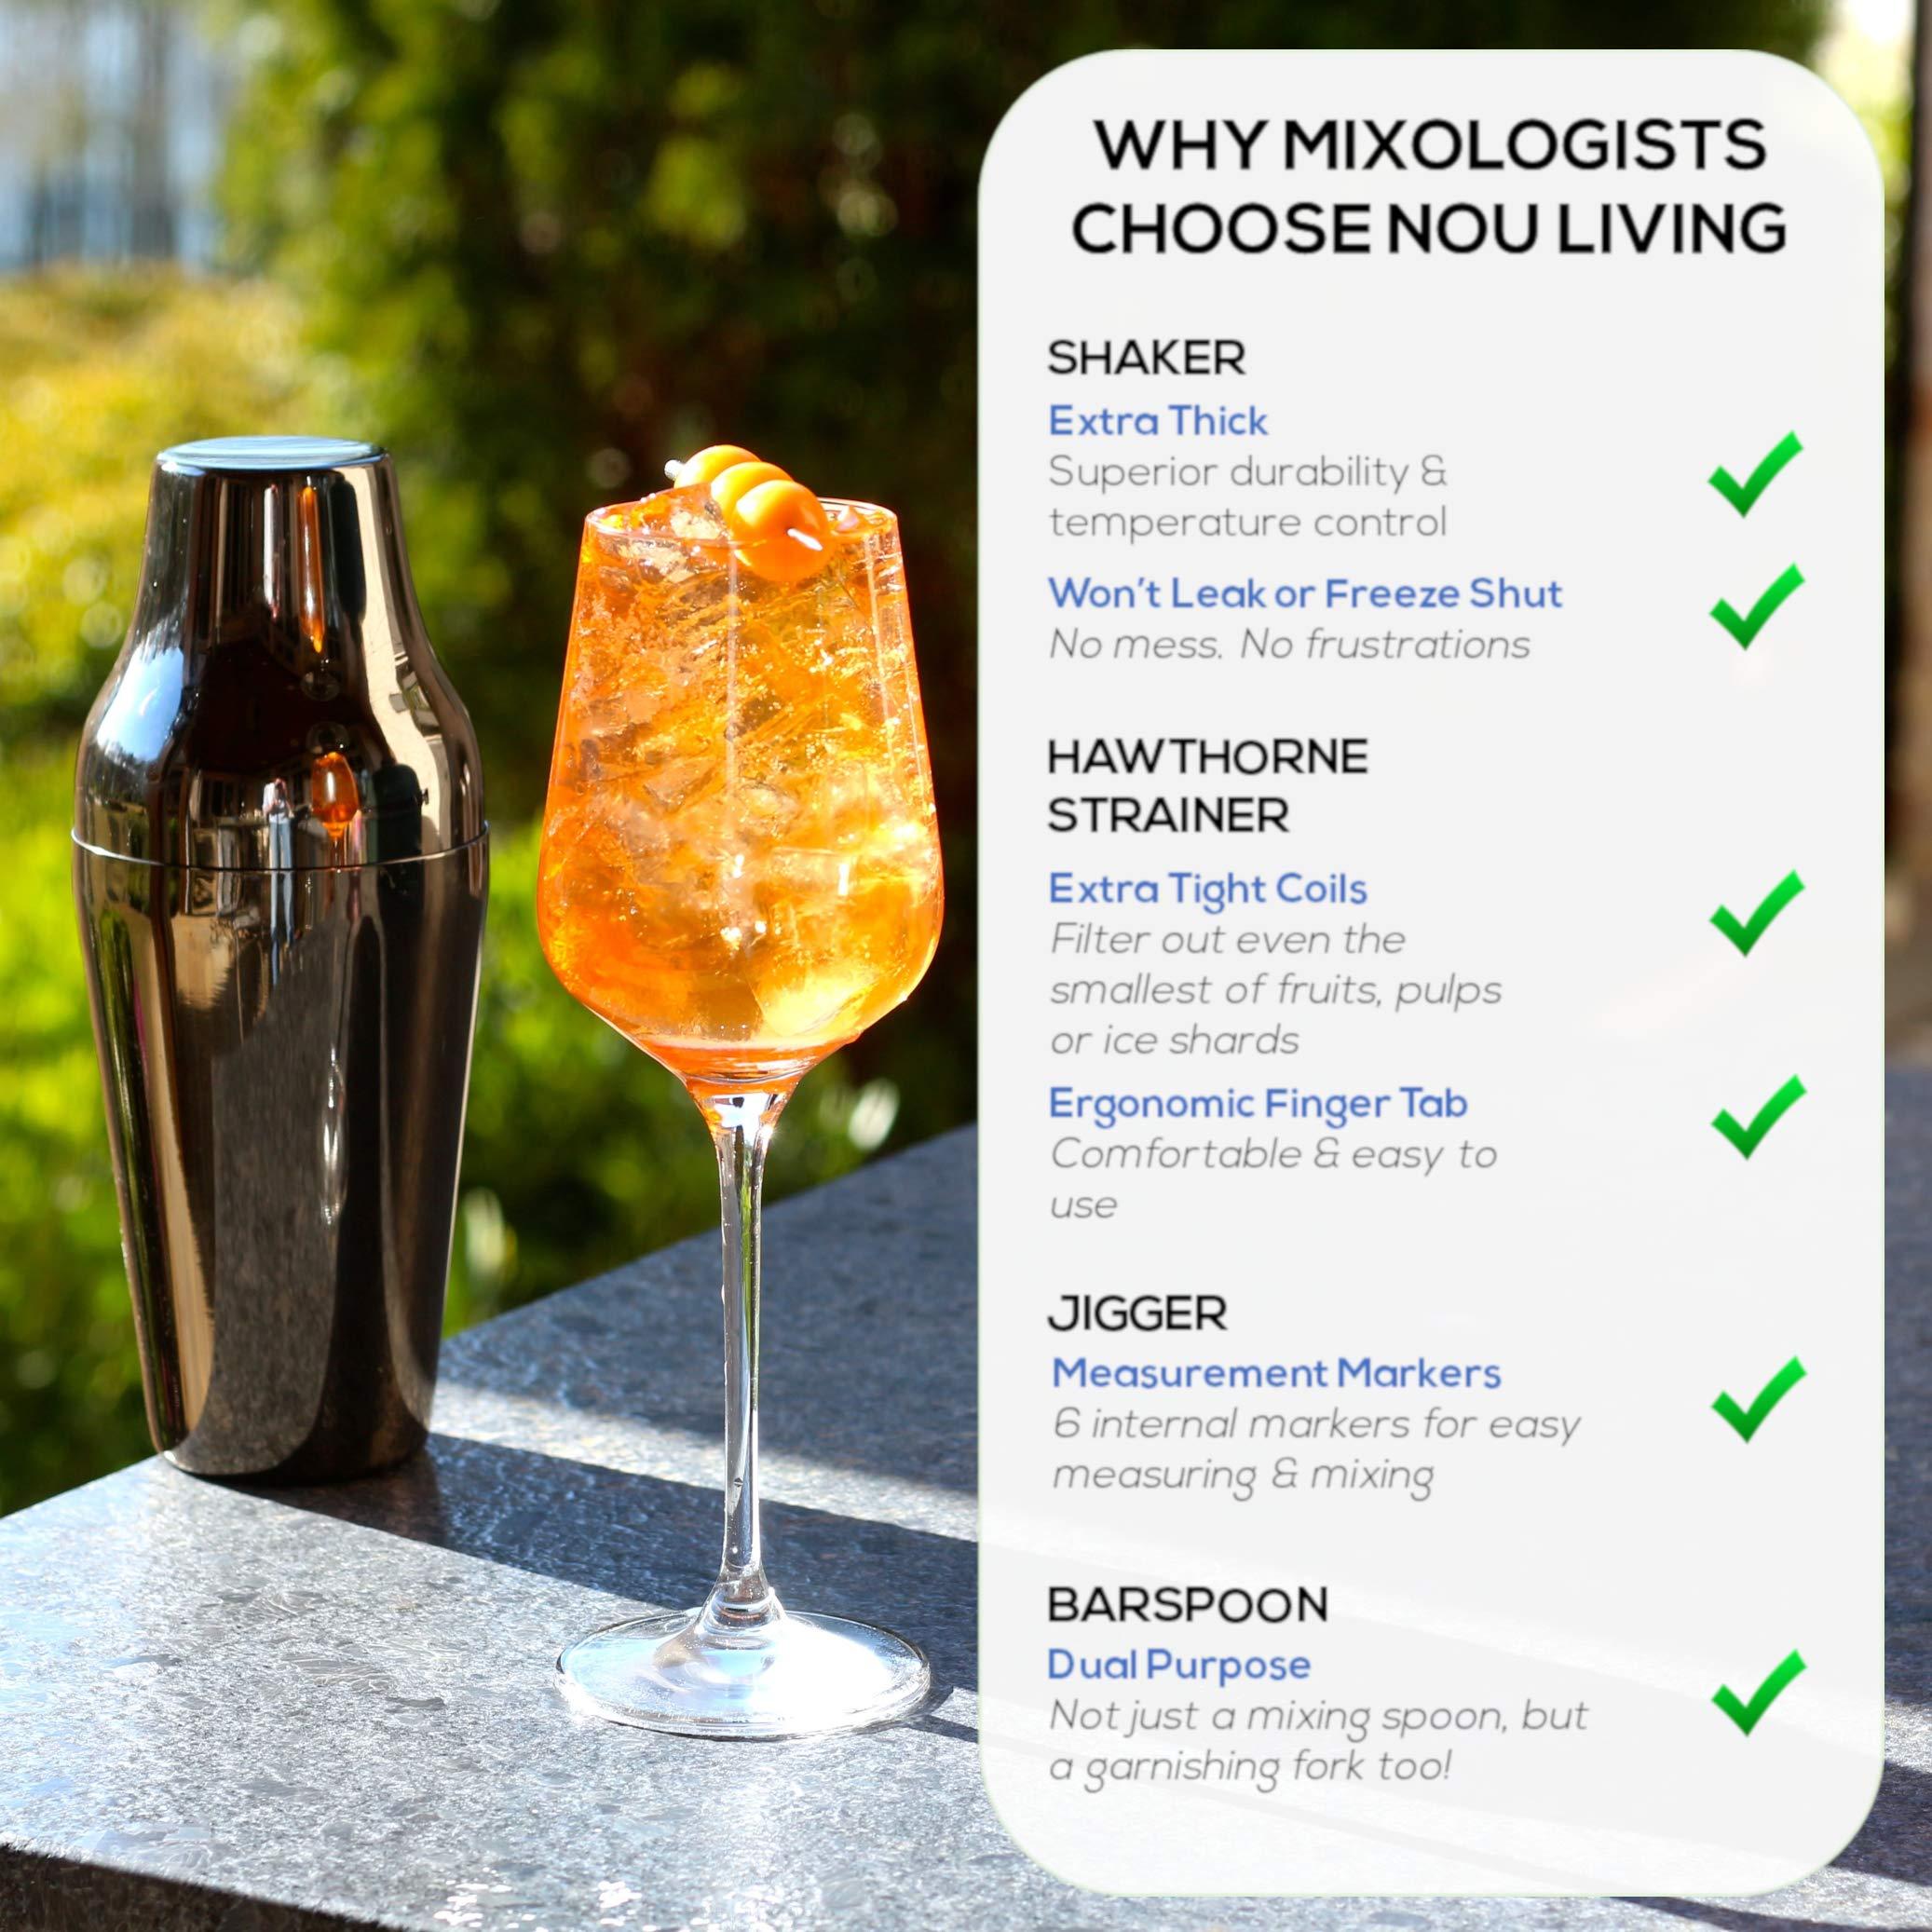 Premium Cocktail Shaker Set and Mixology Bartender Kit - Luxury Bar Set & Bartending Tools: Parisian Drink Shaker, Strainer, Muddler, Jigger, Mixer Spoon, Accessories & Recipe E-Book - Gun Metal Black by Nou Living (Image #2)